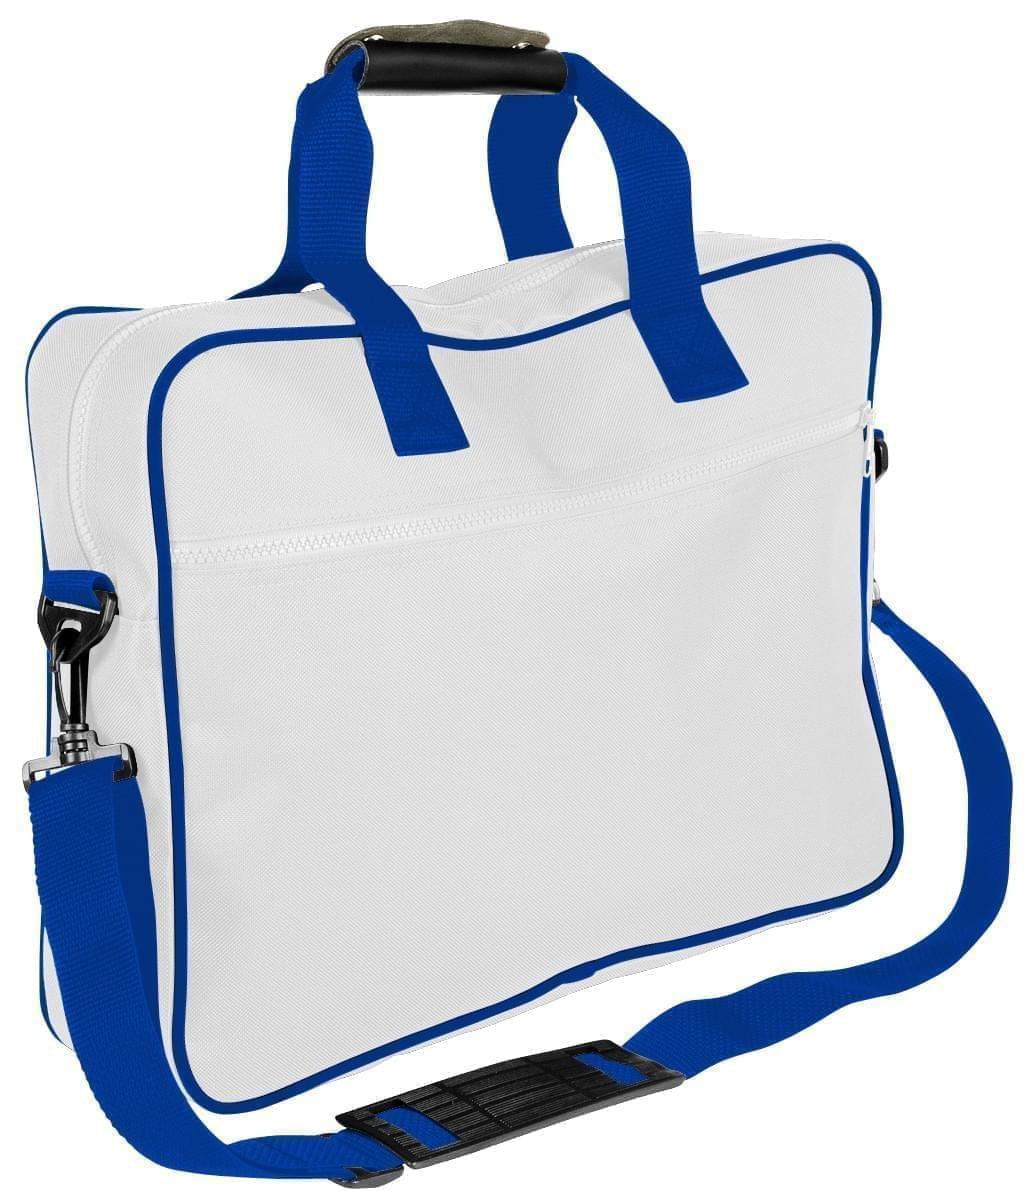 USA Made Nylon Poly Notebook Sleeves, White-Royal Blue, CPKVA59P33